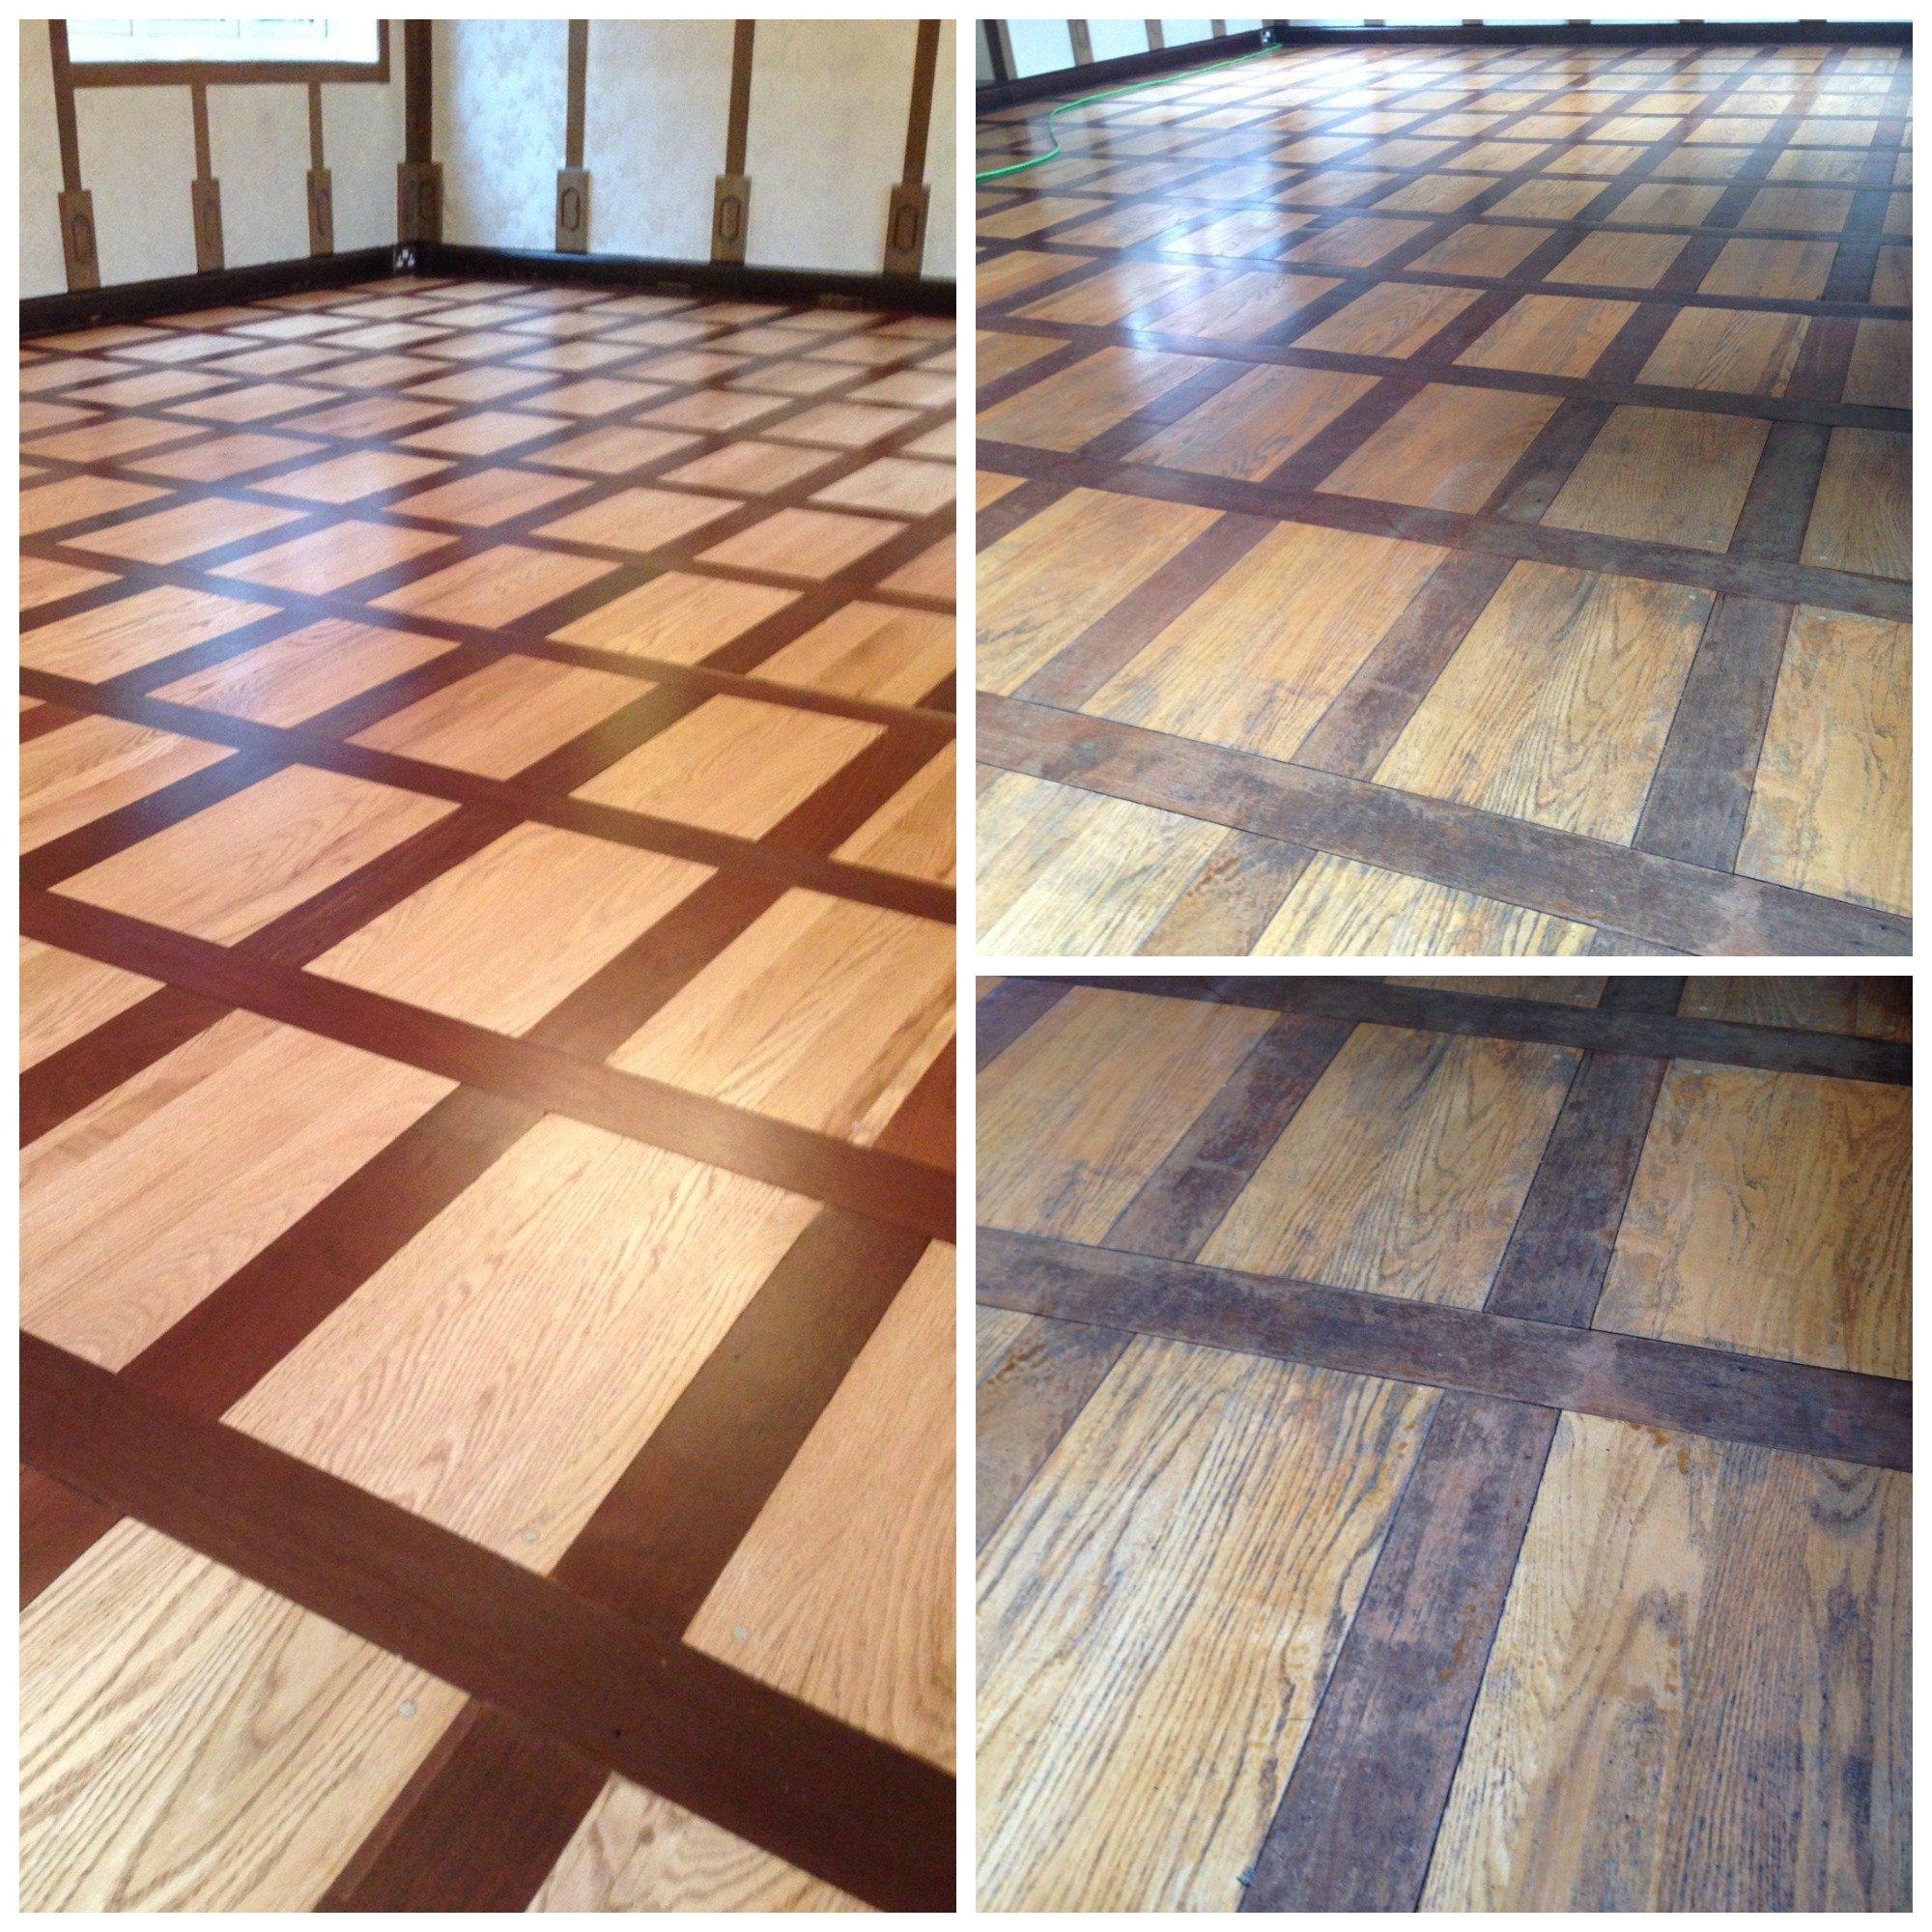 Karndean Flooring Ers Stockport Carpet Vidalondon